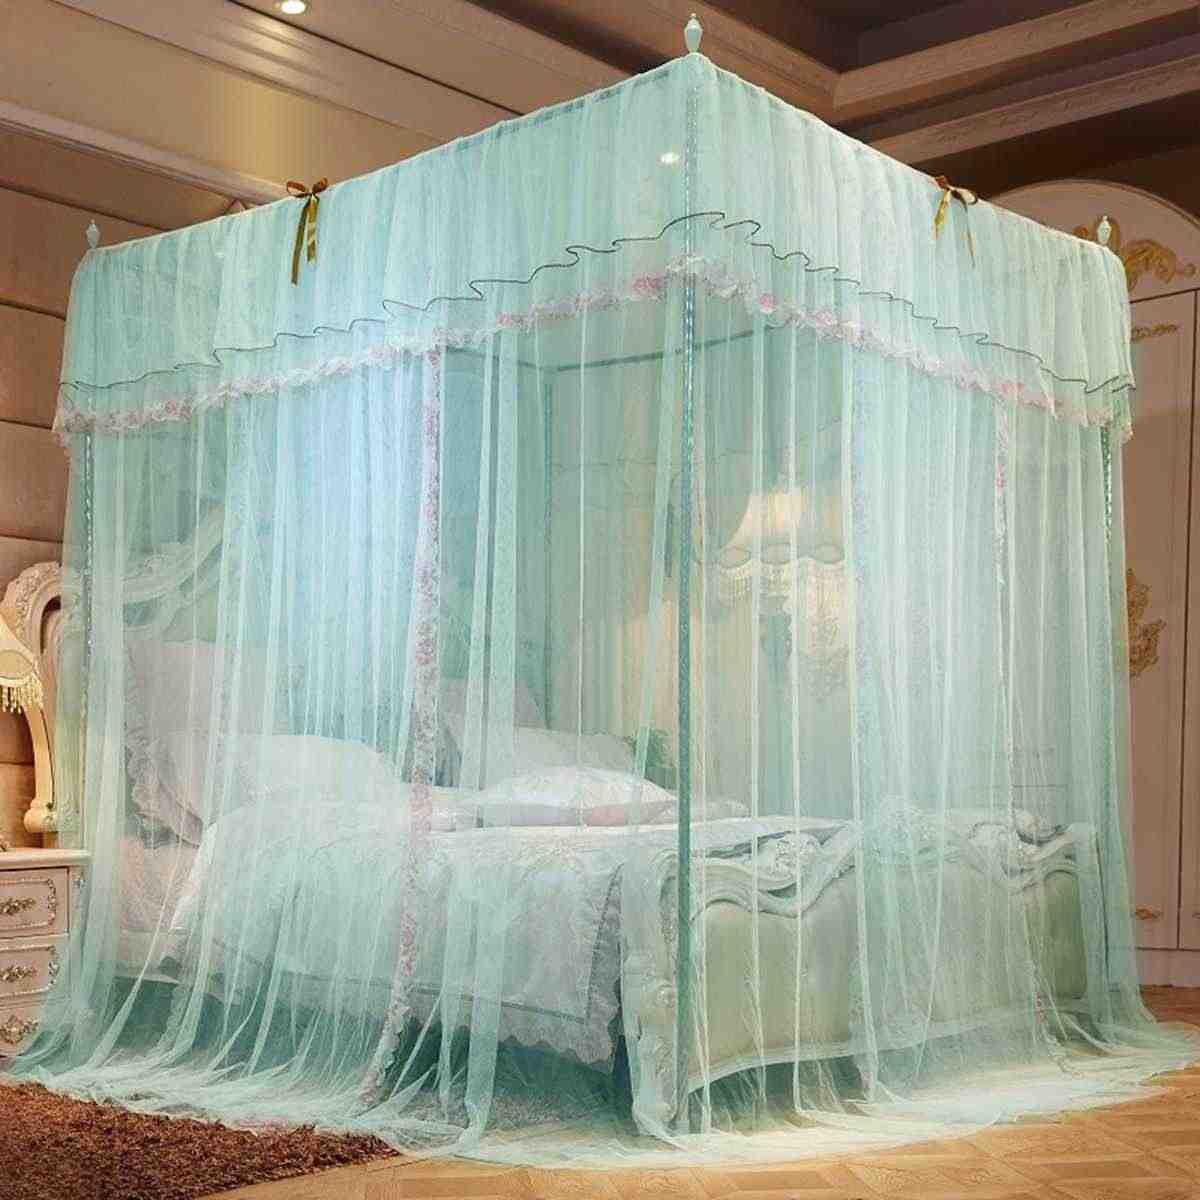 bedding girl princess mosquito net bed canopy tent curtain room decor klamboe baldachim ciel de lit camas dormitorio